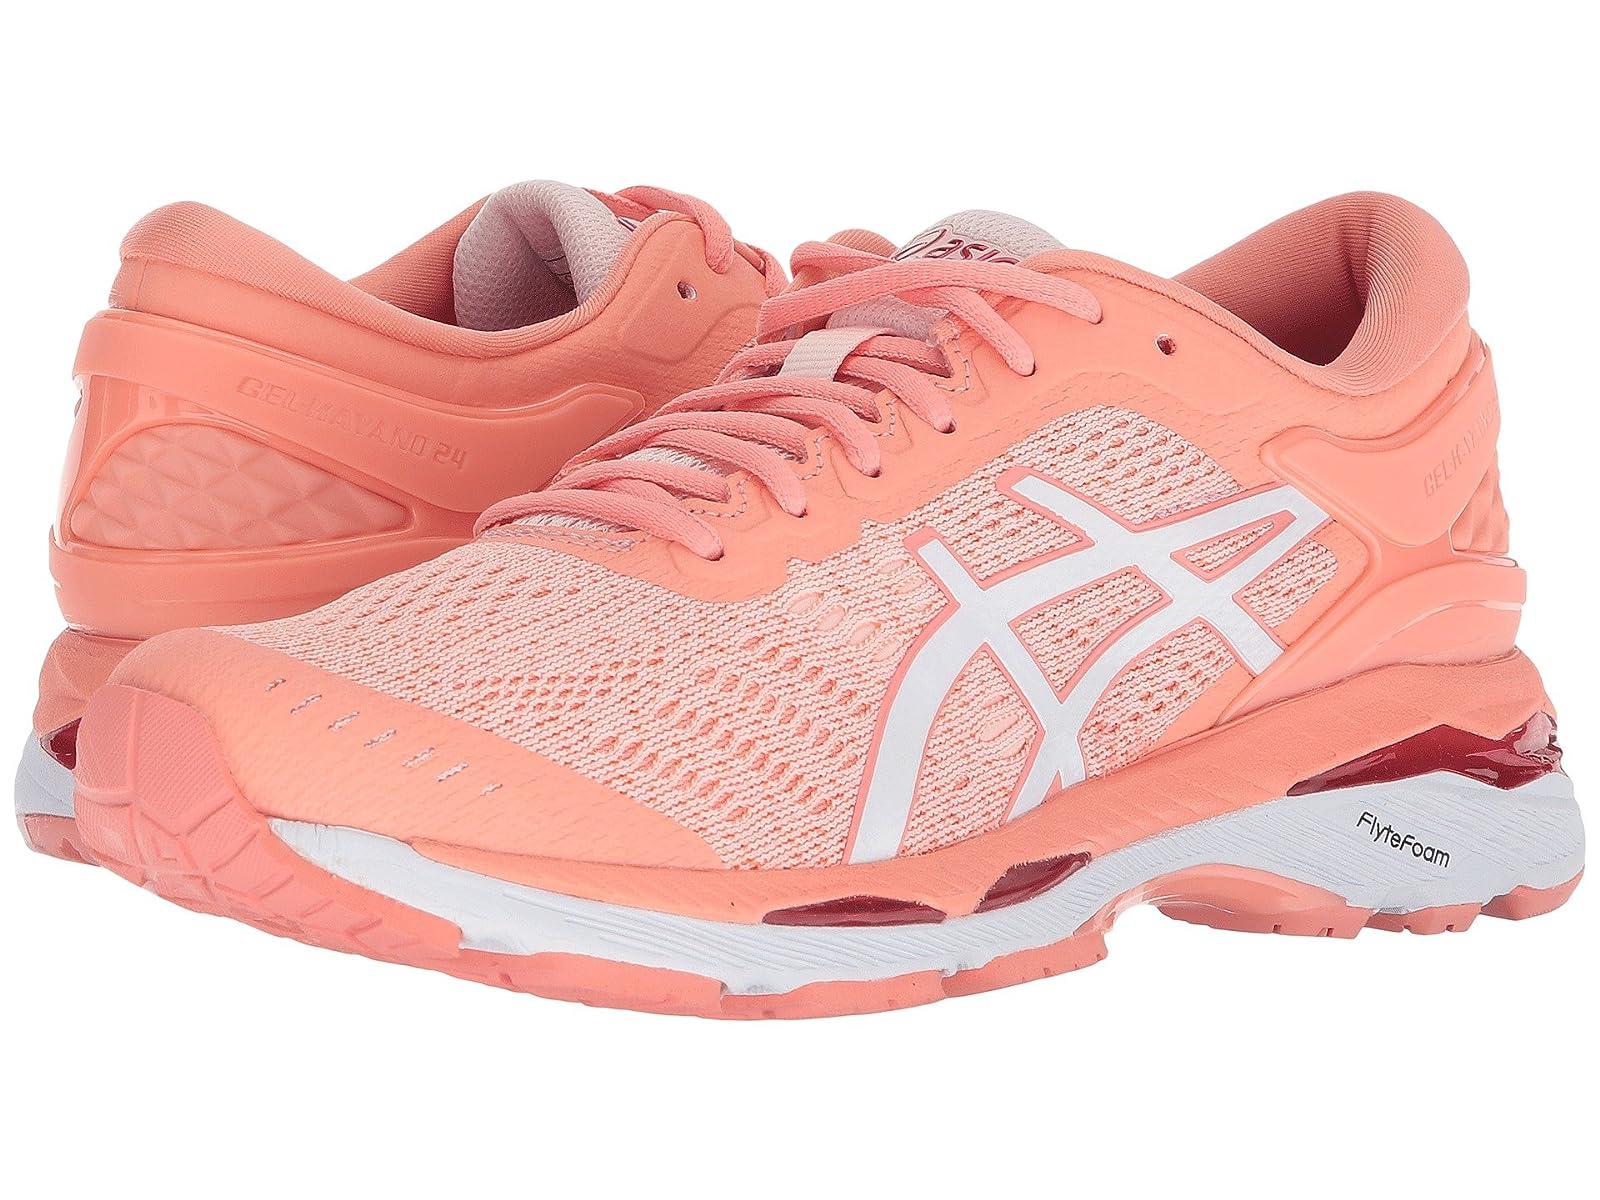 ASICS GEL-Kayano® 24Atmospheric grades have affordable shoes